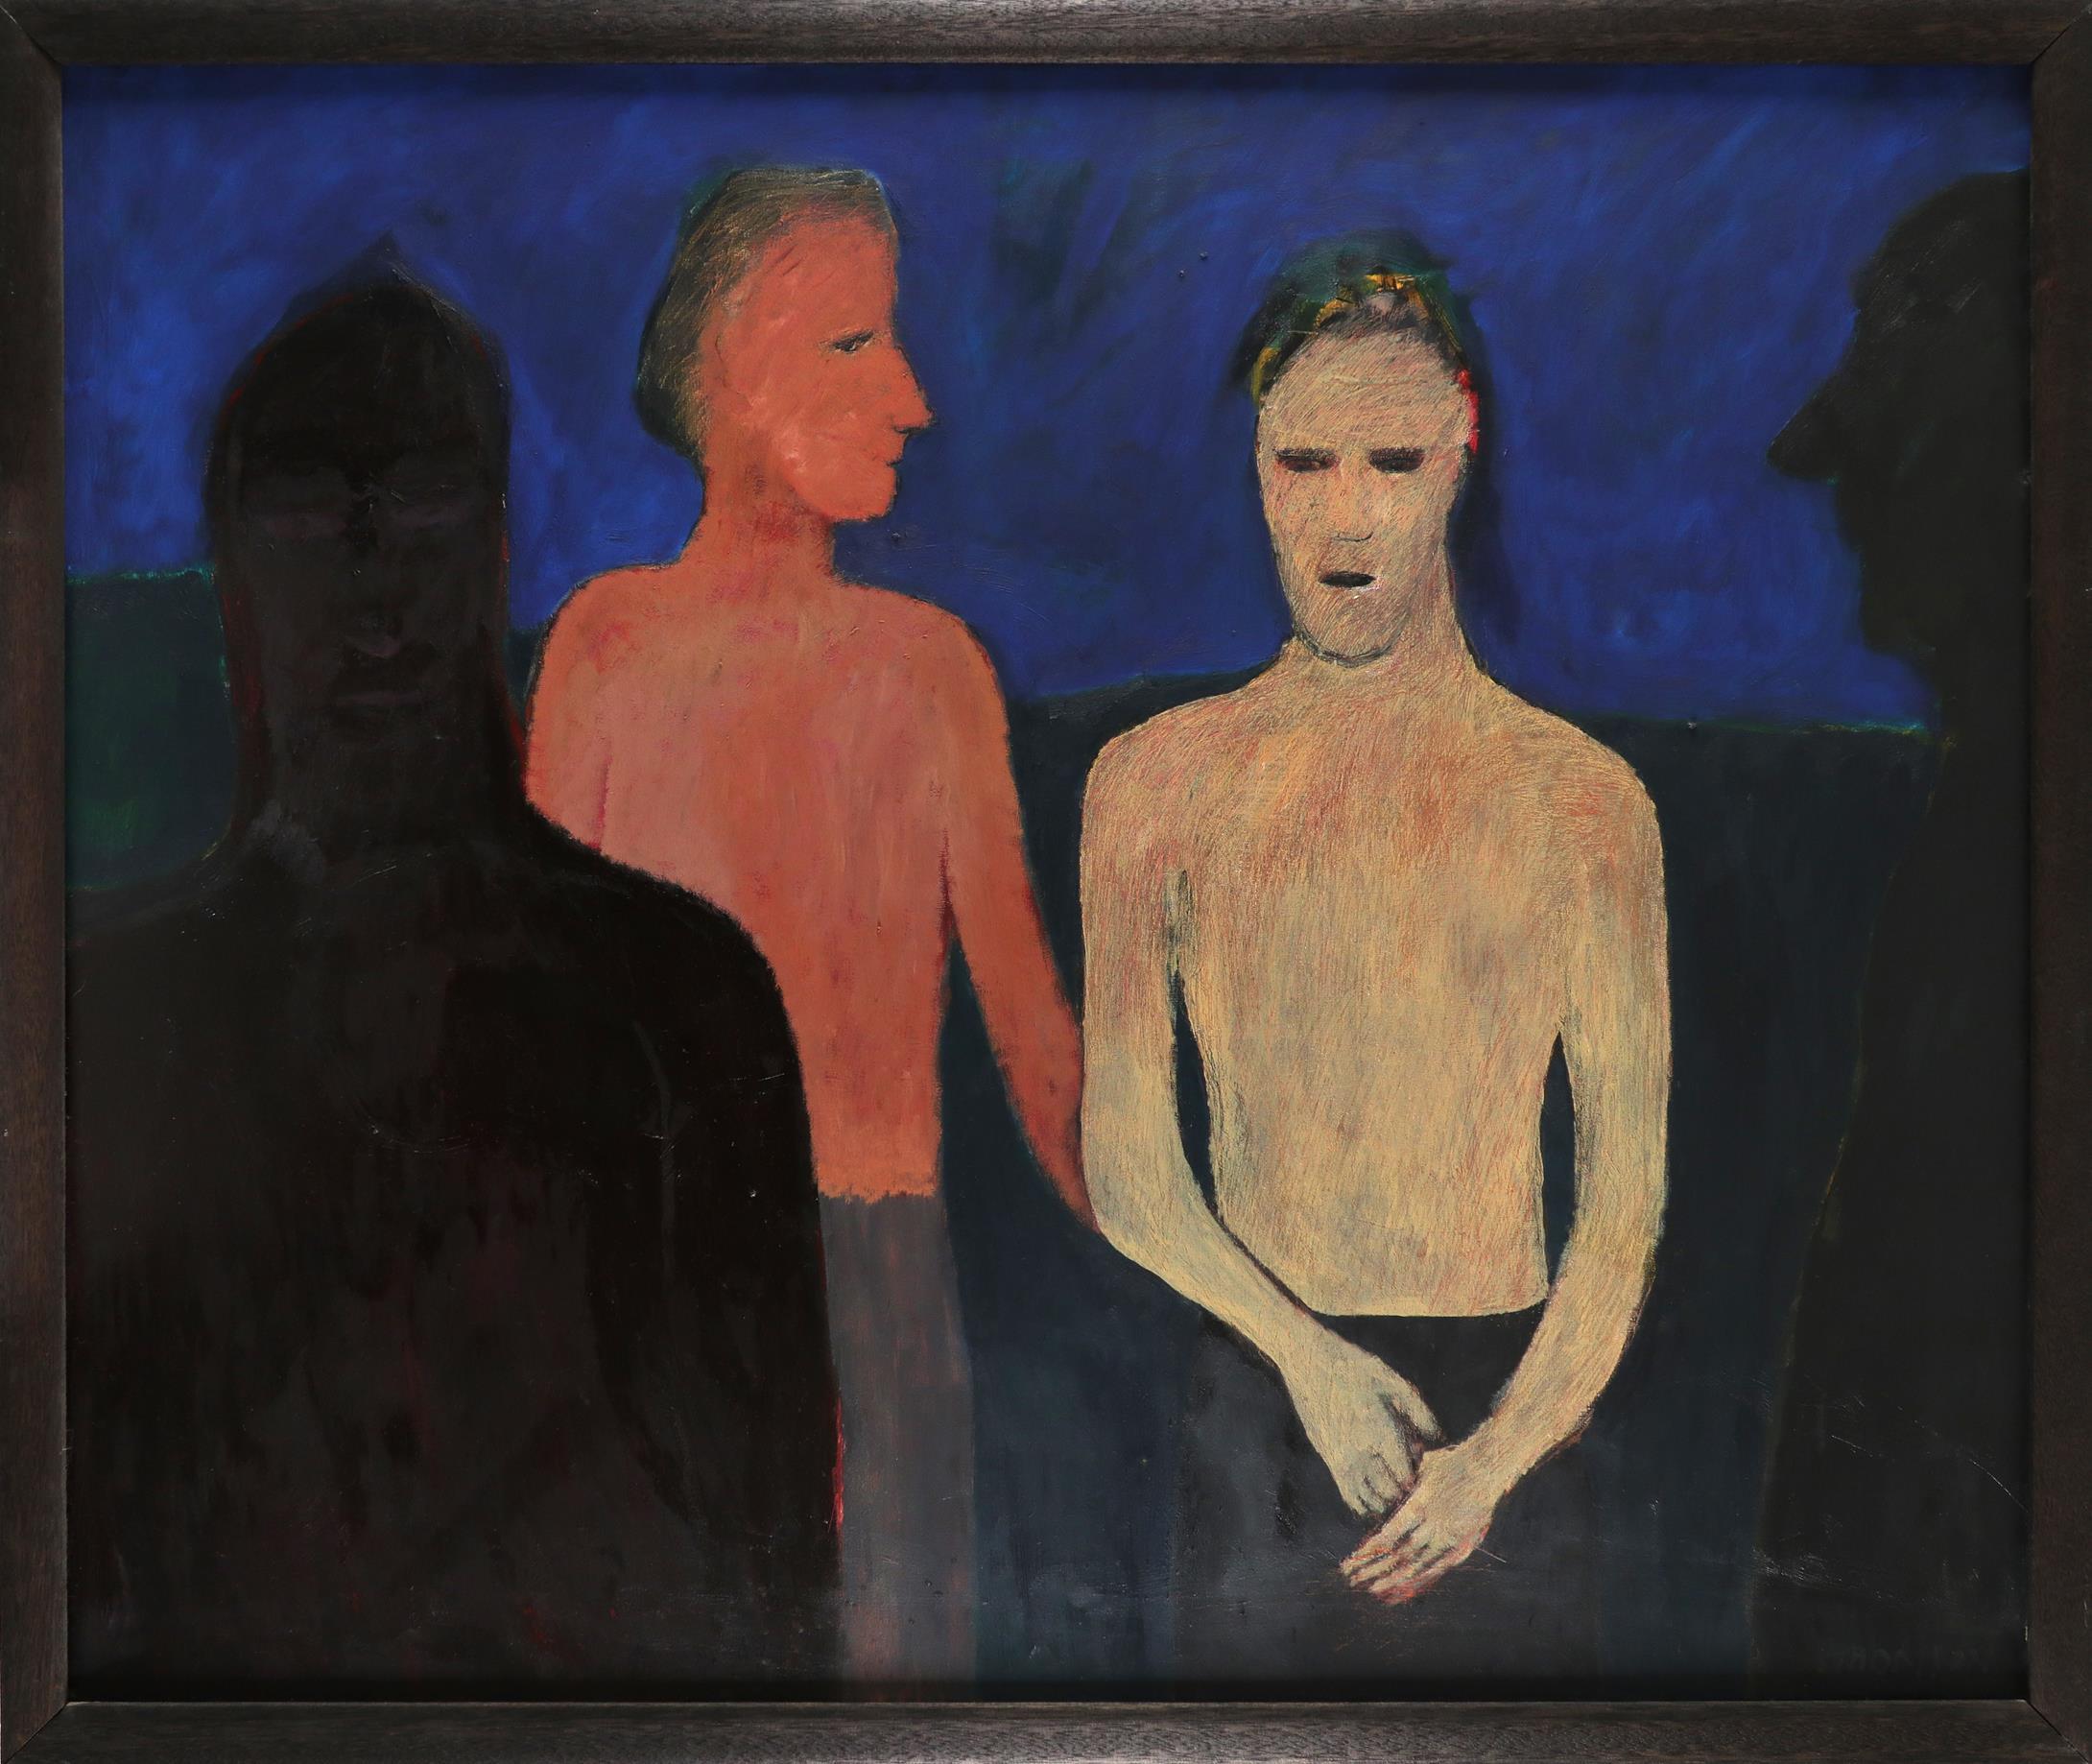 ‡Douglas Thomson (Scottish b.1955) Dawn Signed THOMSON (lower right) Oil on canvas 114.5 x 138cm - Image 2 of 3